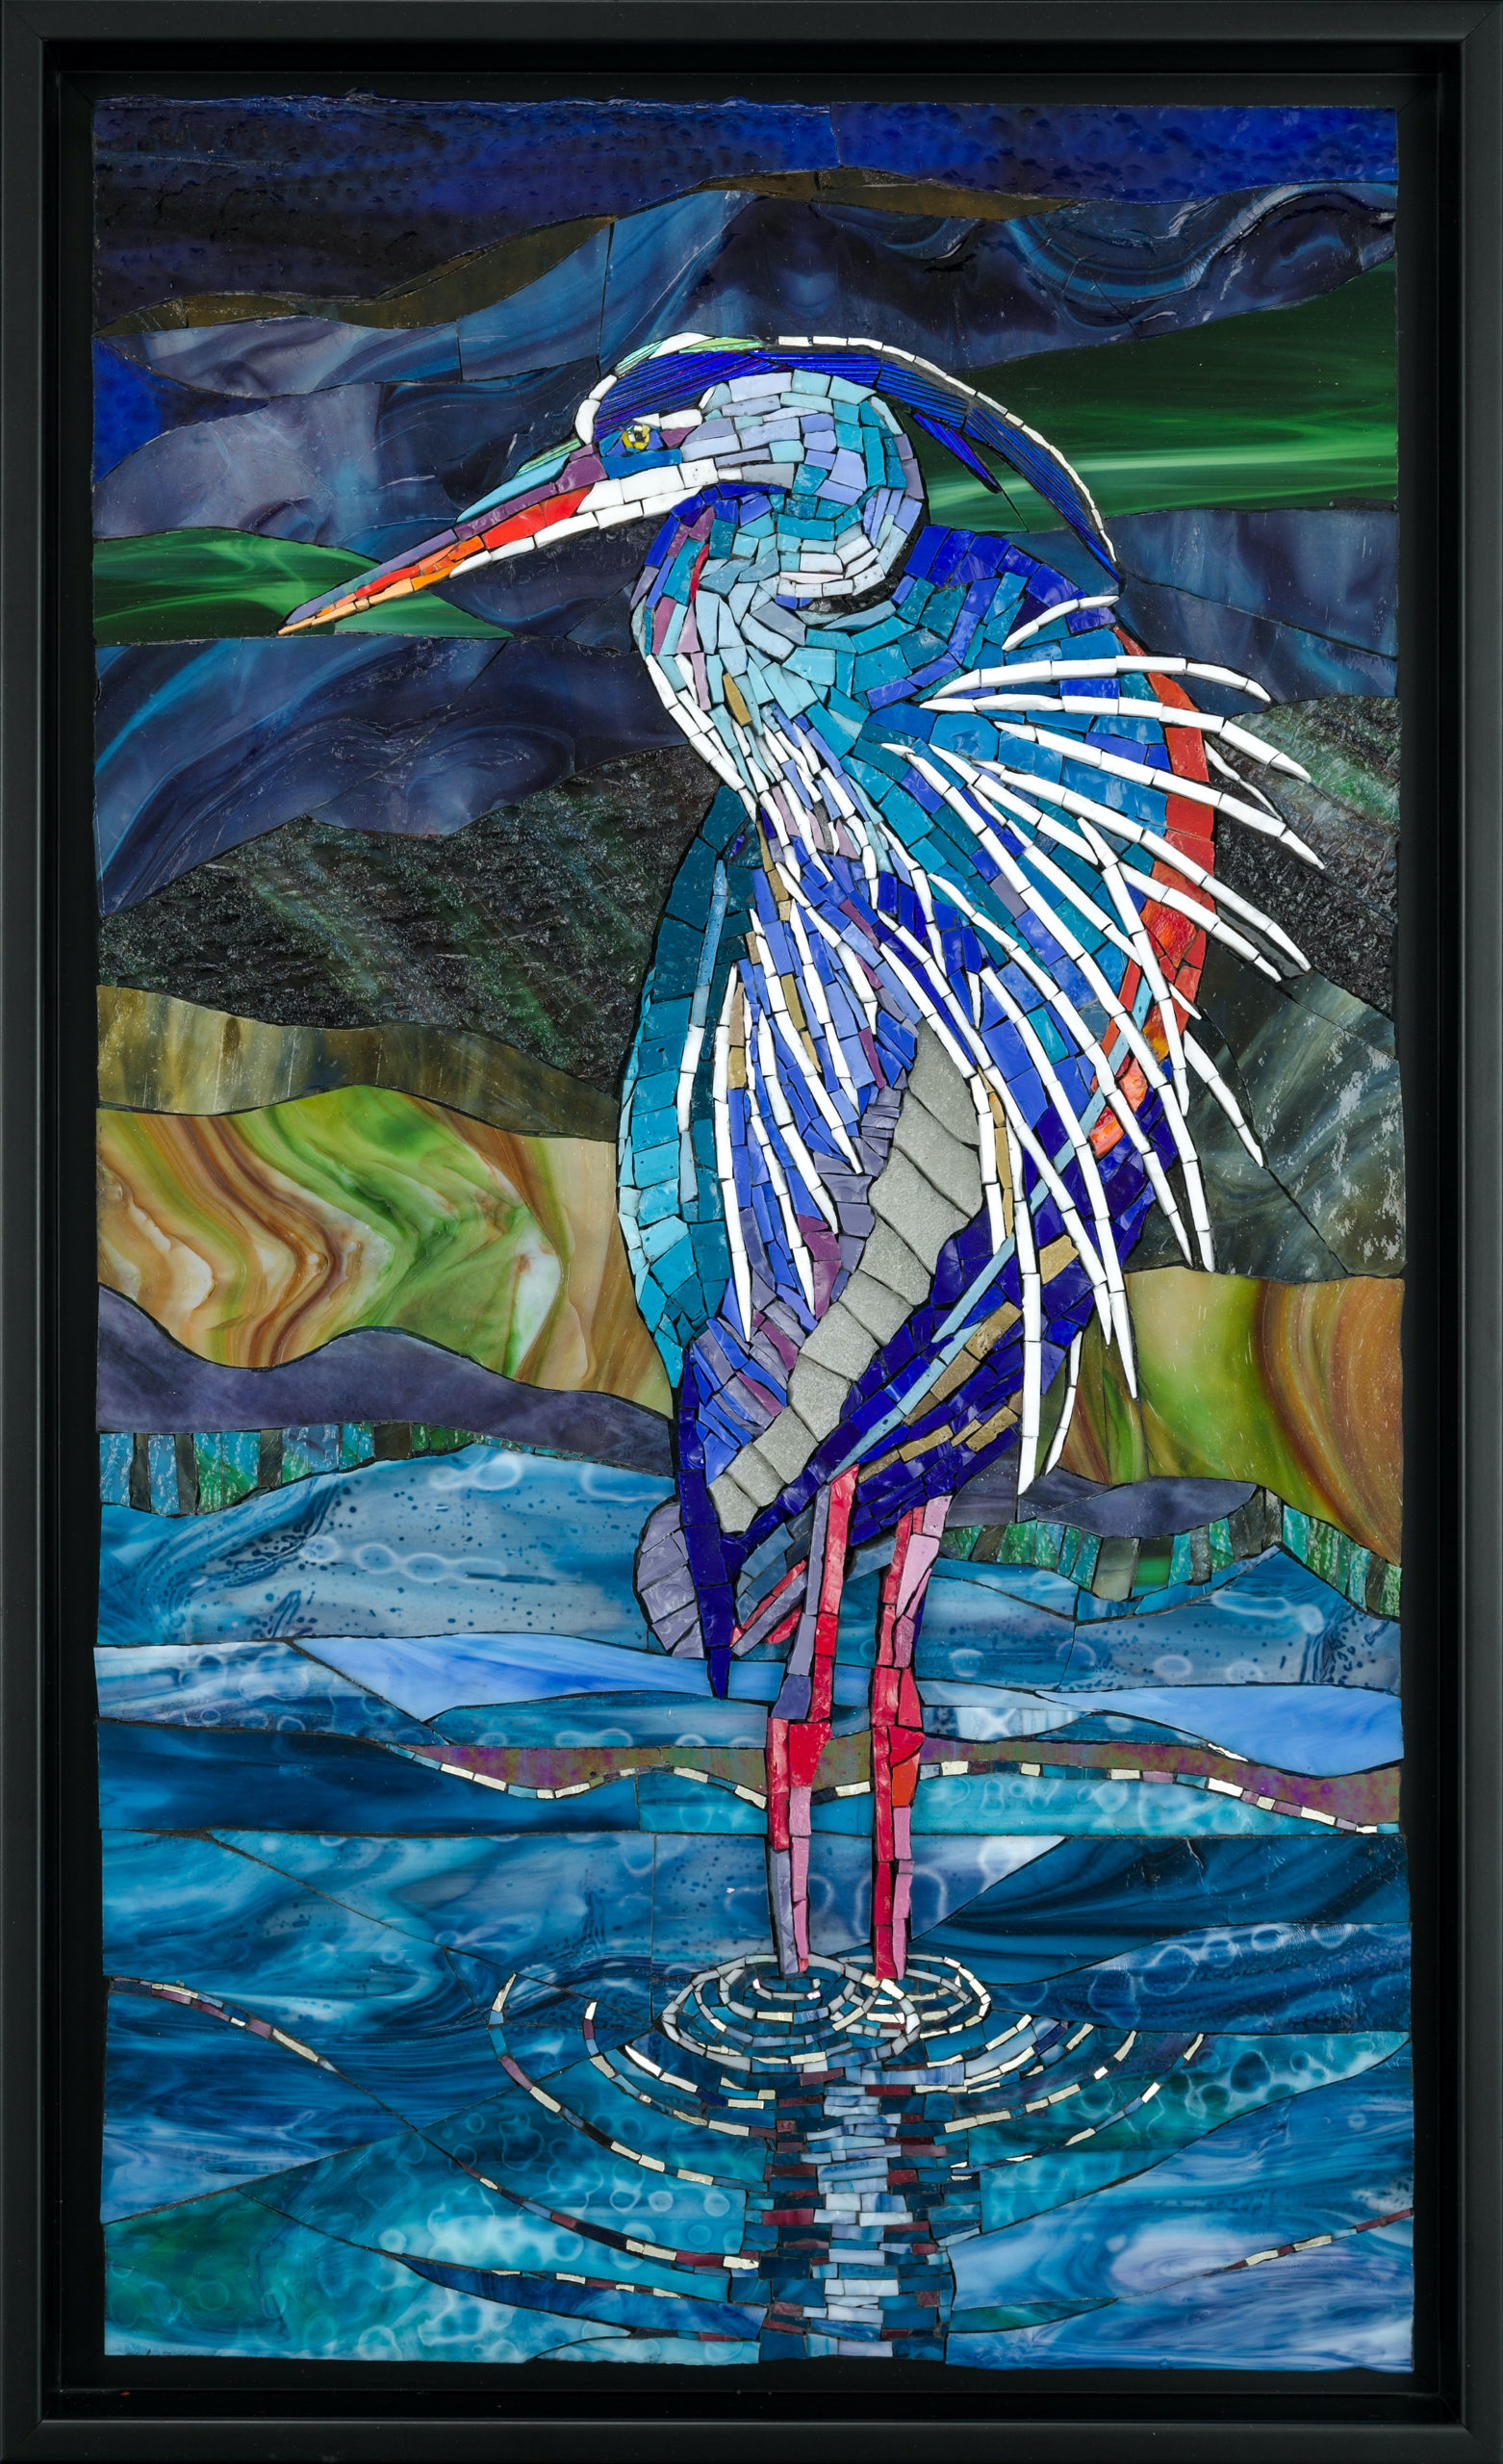 Michele Sider, Great Blue Heron 1, 2020